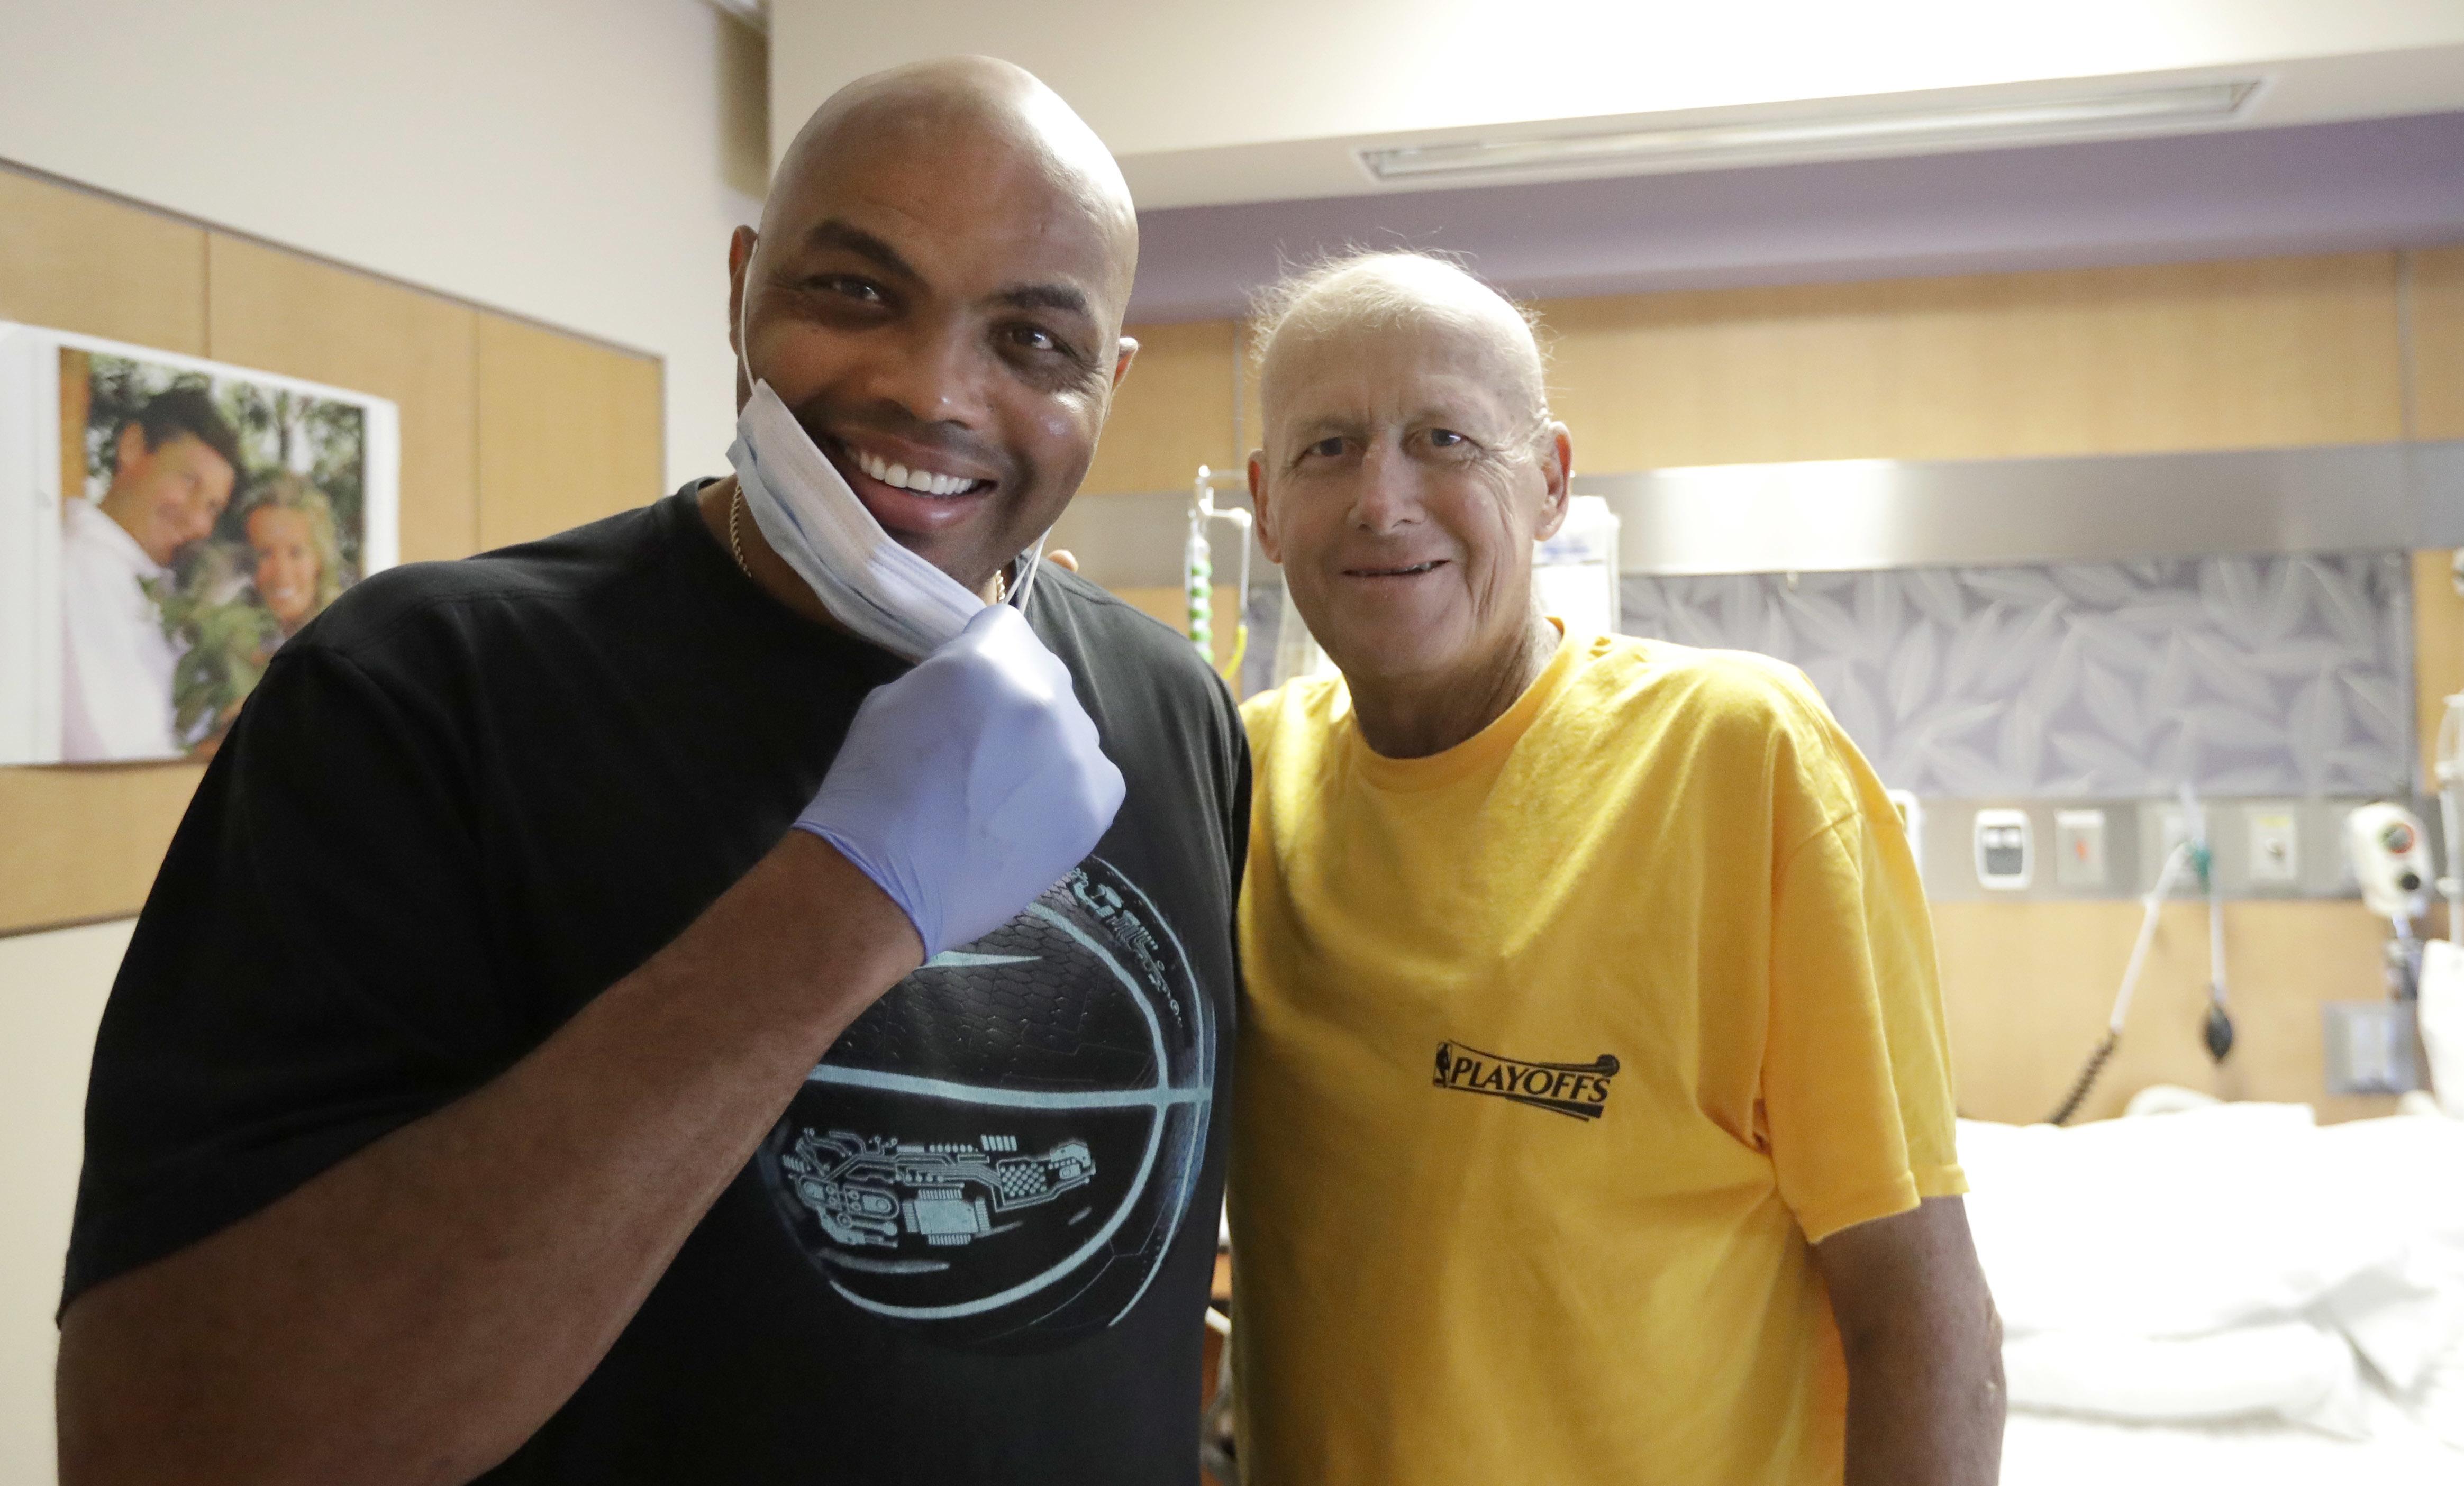 Craig Sager Leukemia Basketball